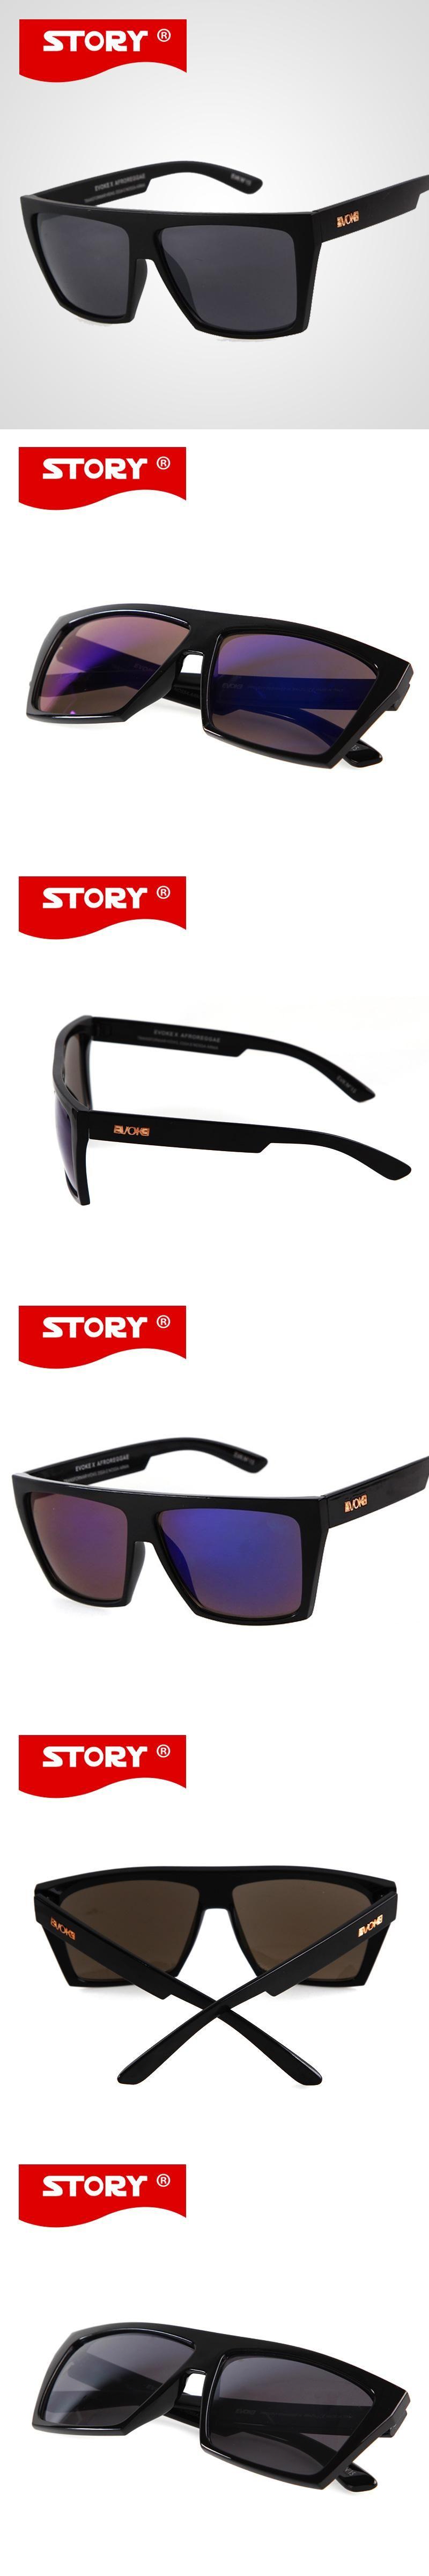 EVOKE Sunglasses Mens Square Sport Coating Amplifier Sun Glasses STORY 12  Colors Men Outdoor Oculos de 762eec894f